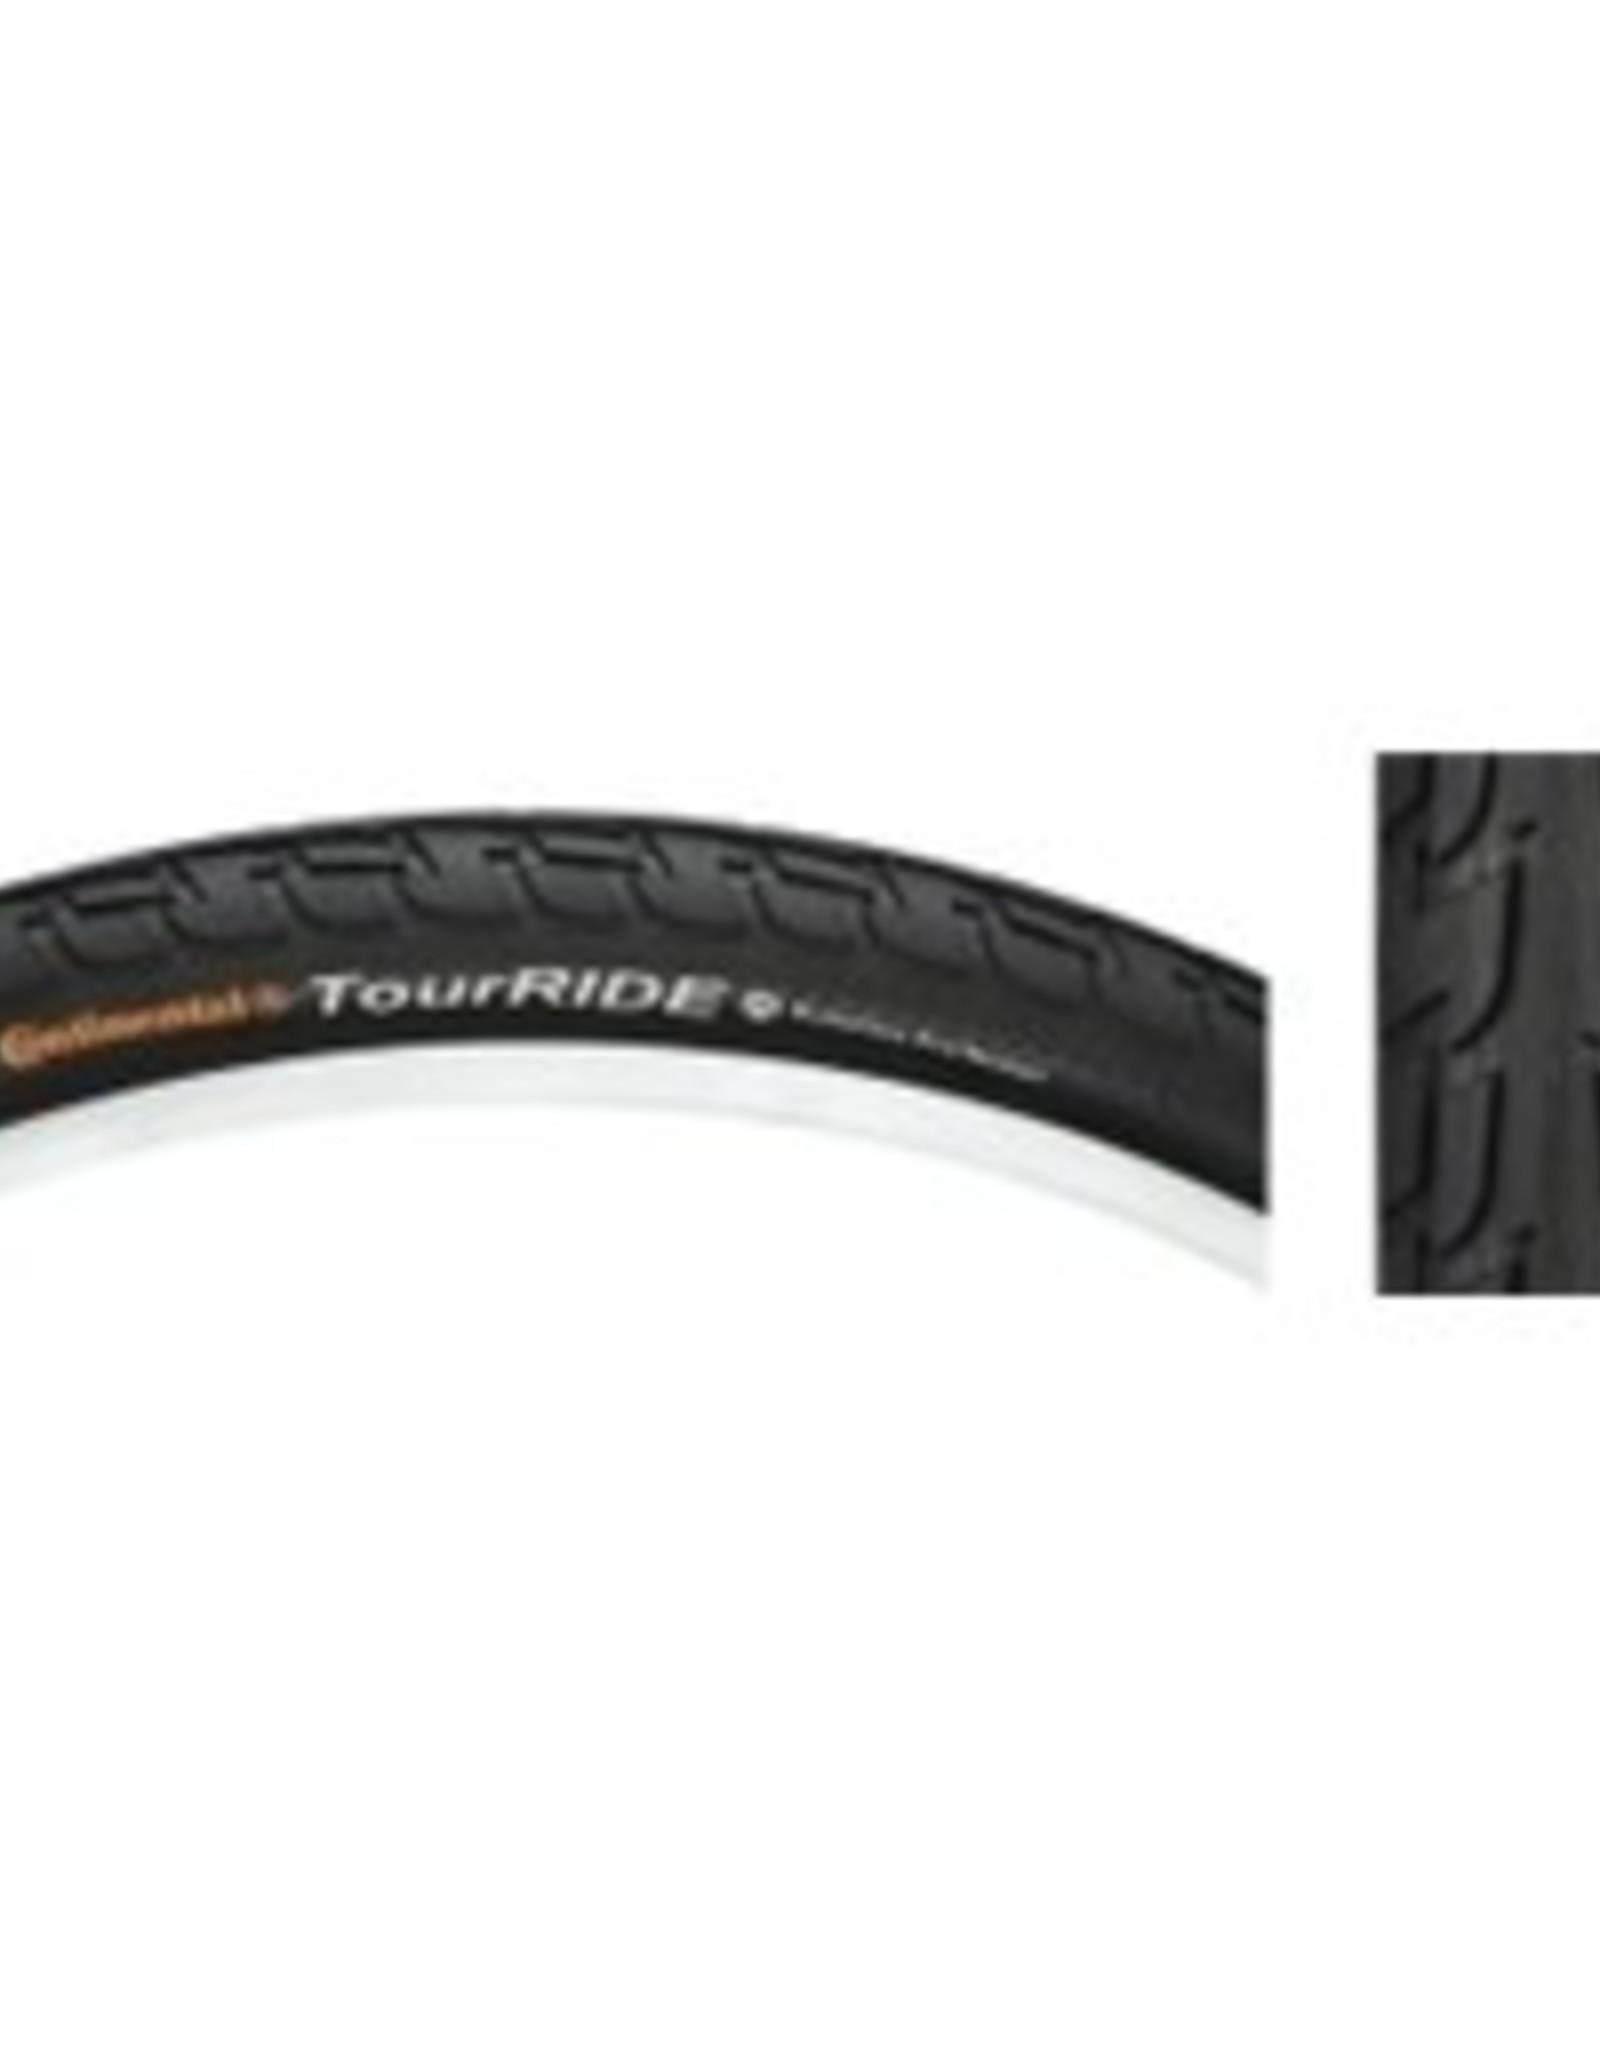 Continental Continental Tour Ride Tire 700 Black